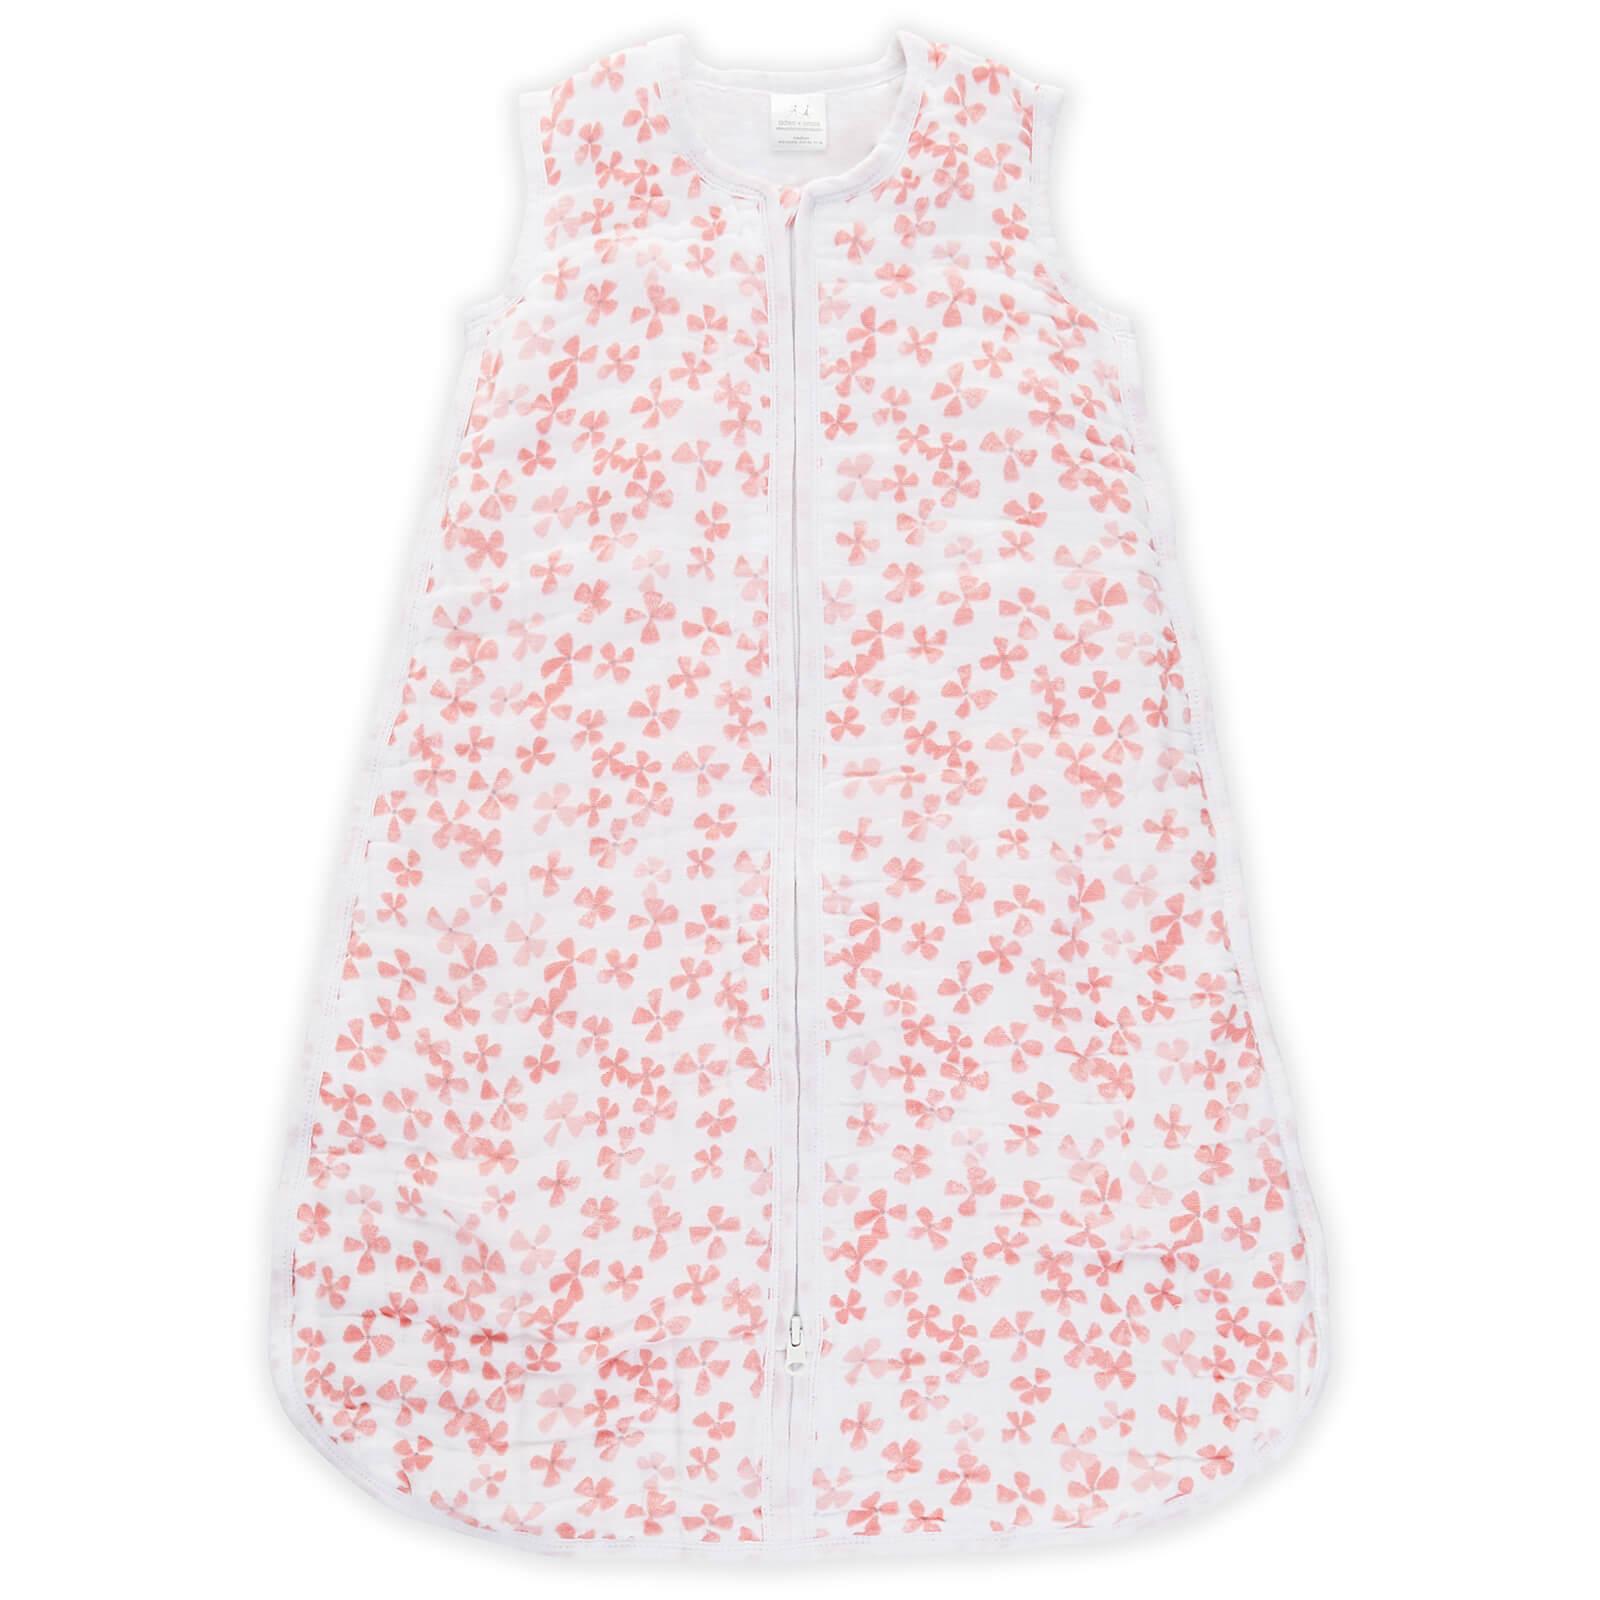 aden + anais Multi-Layer Sleeping Bag - Birdsong - Blossom - 6-12 months